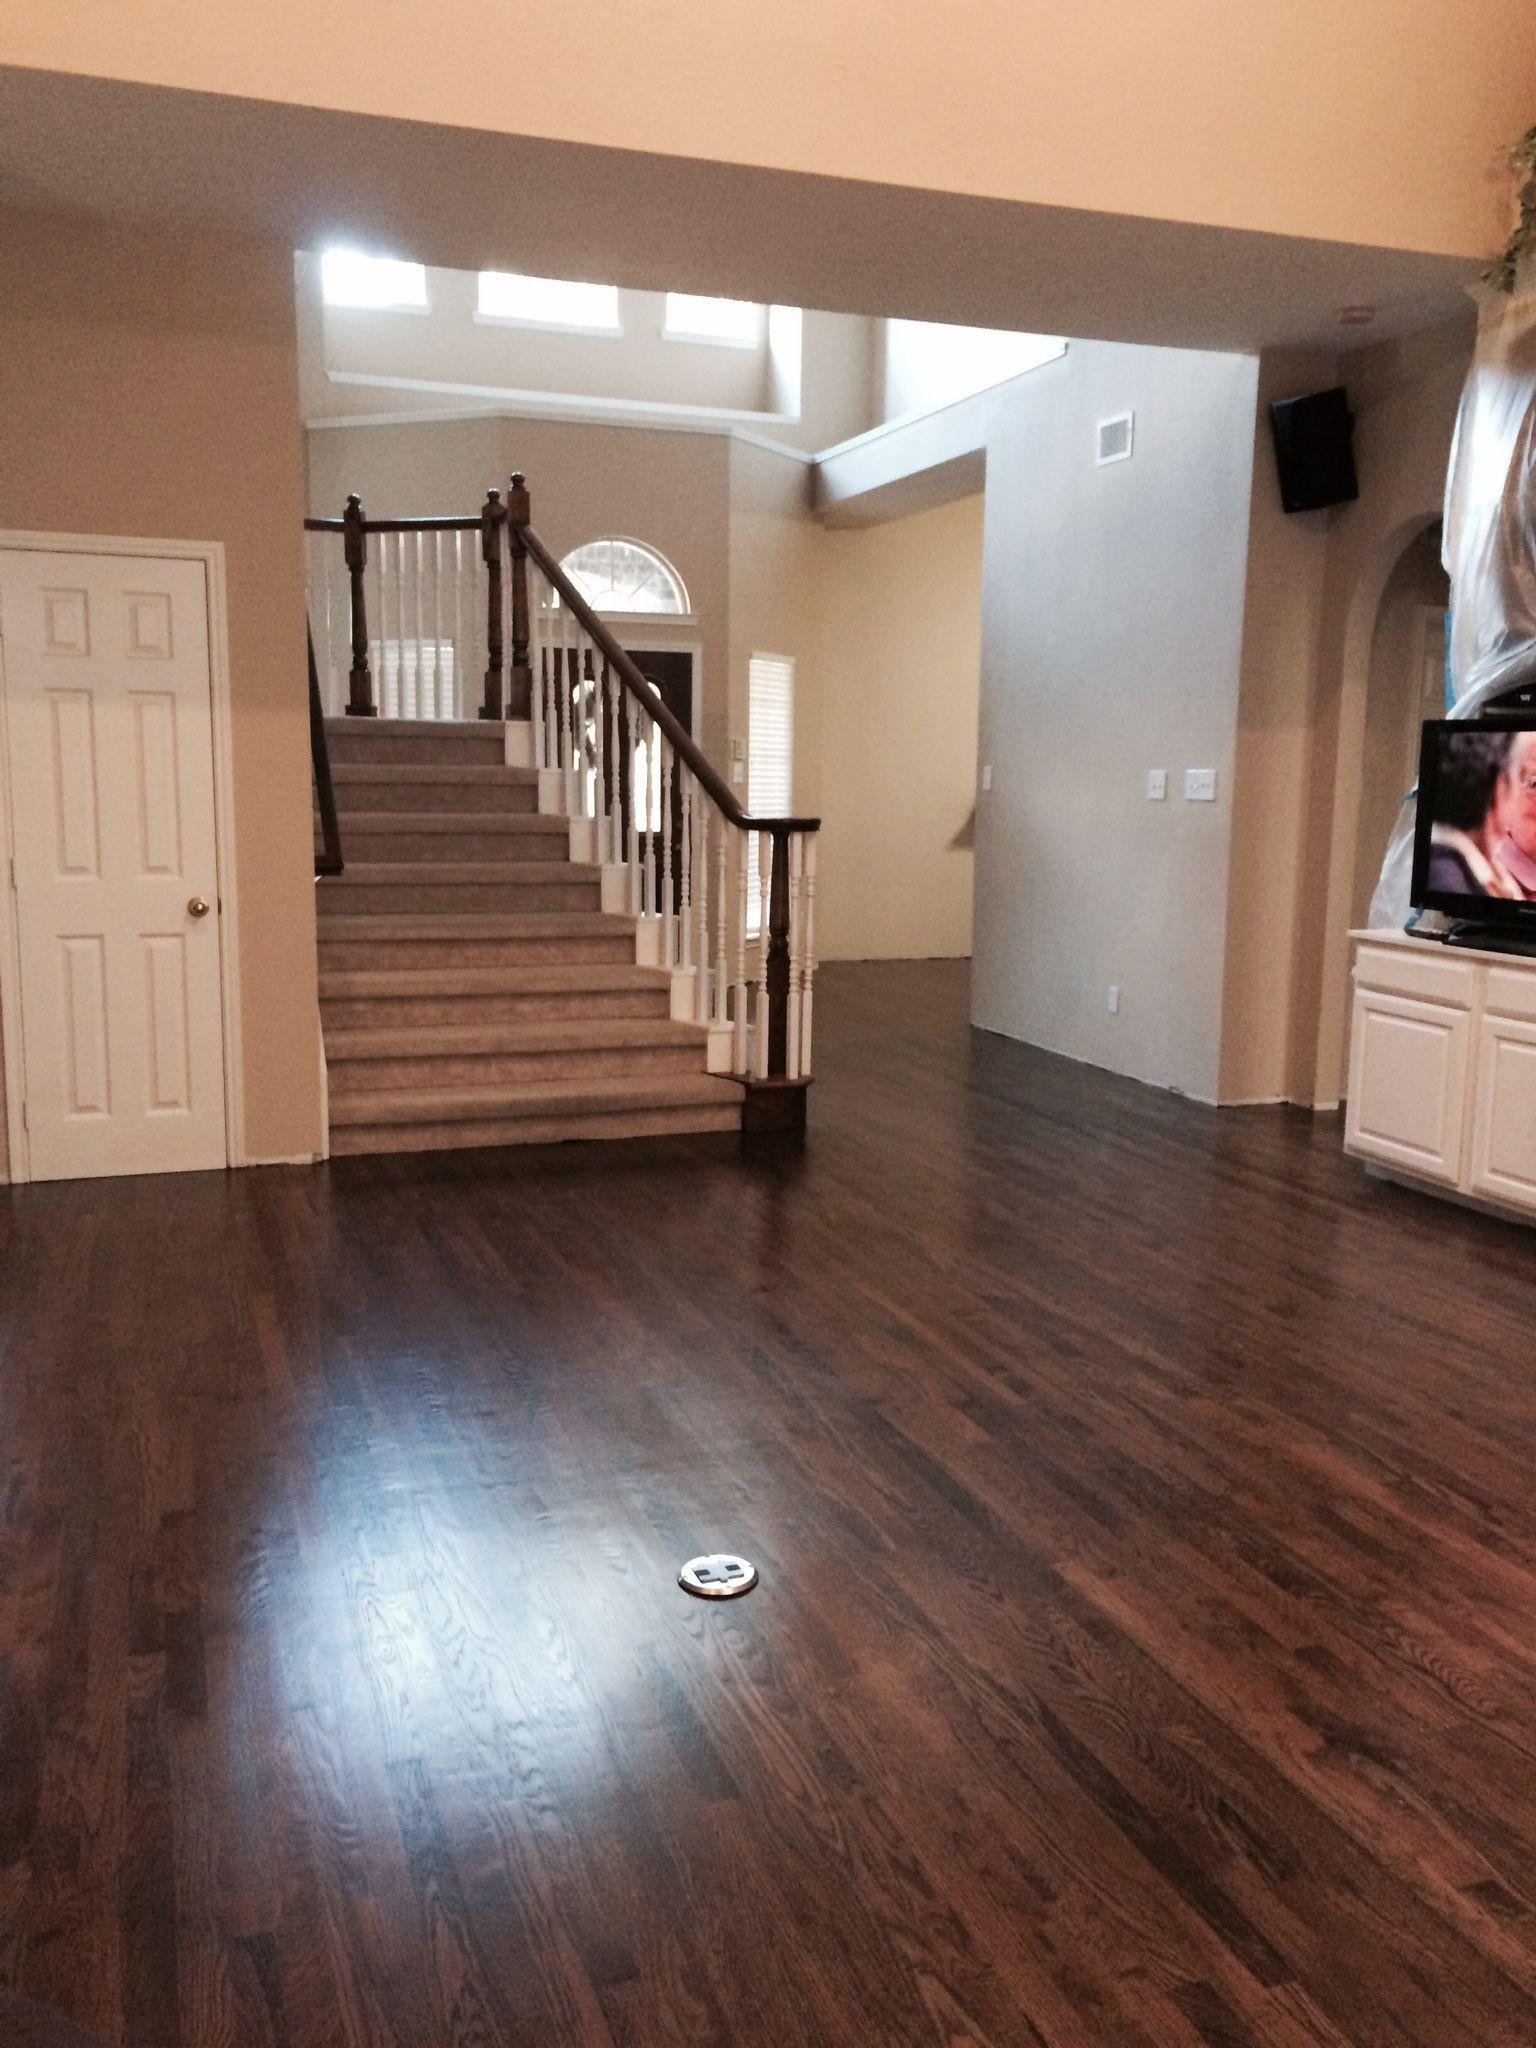 hardwood floor refinishing ct cost of dark walnut stain on white oak hardwood remodel 1floors in 2018 regarding dark walnut stain on white oak hardwood walnut hardwood flooring hardwood floor stain colors